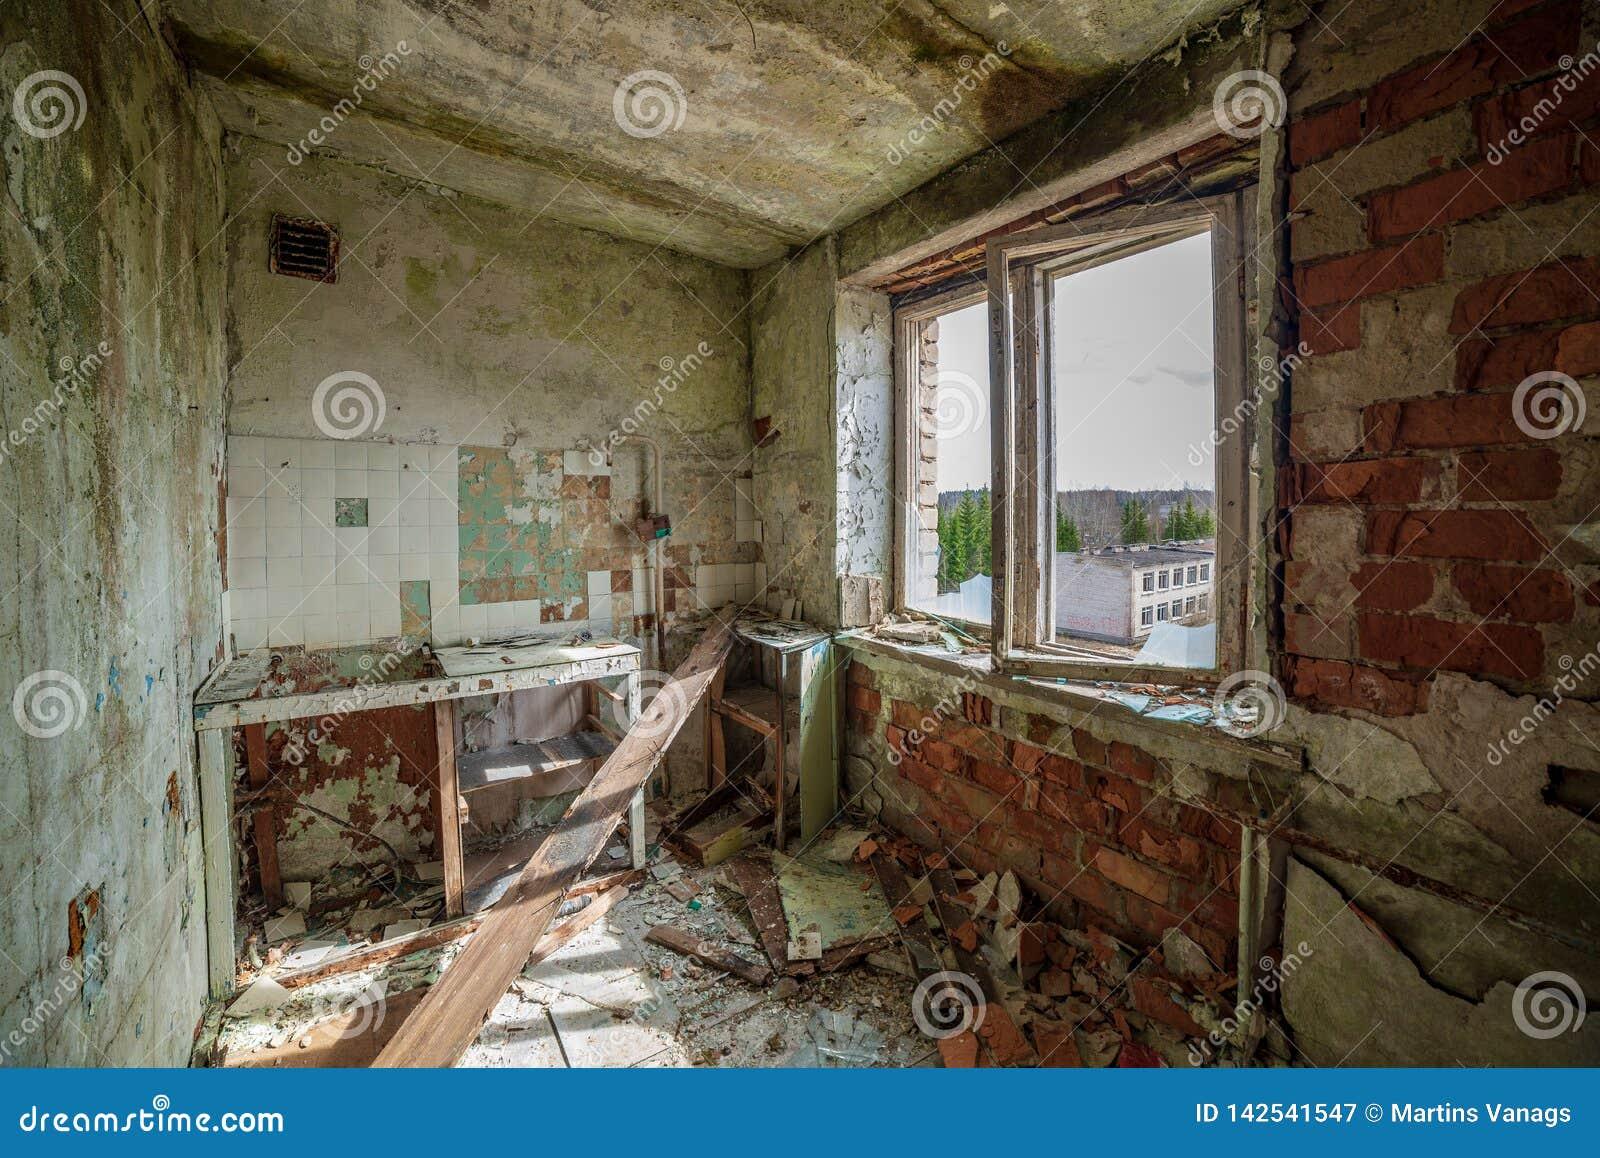 abandoned military buildings in city of Skrunda in Latvia